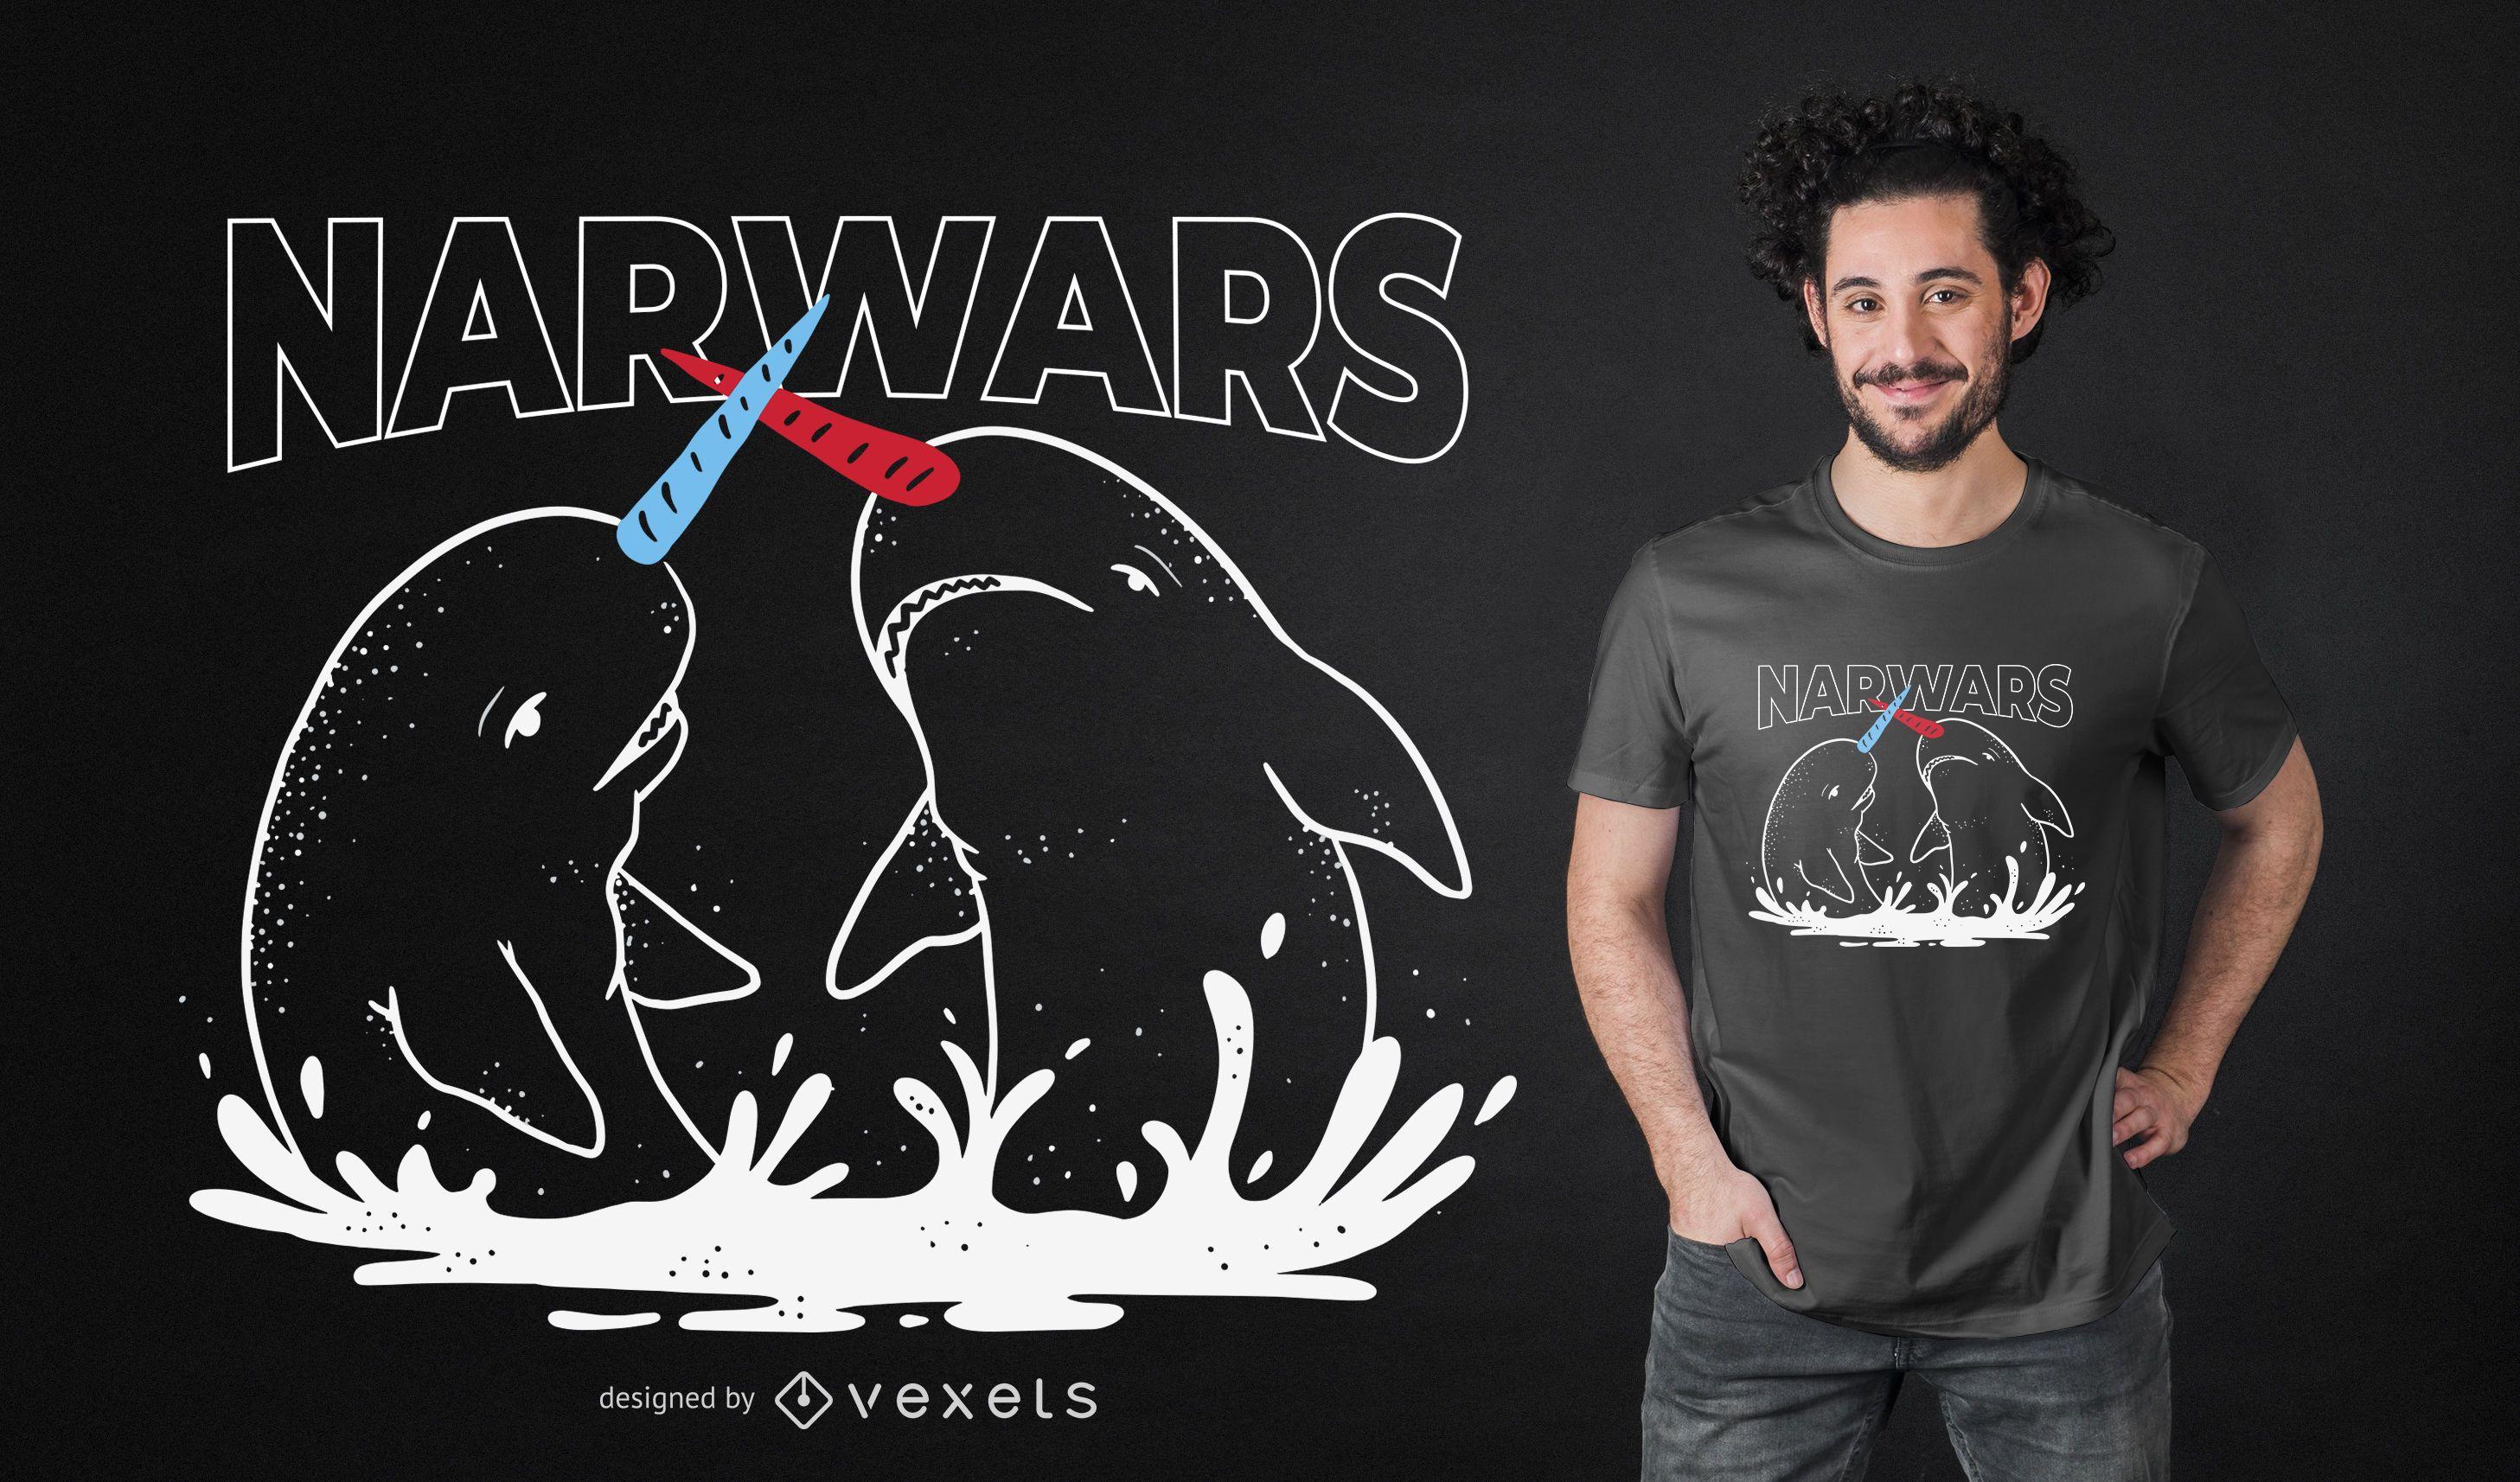 Narwars T-shirt Design